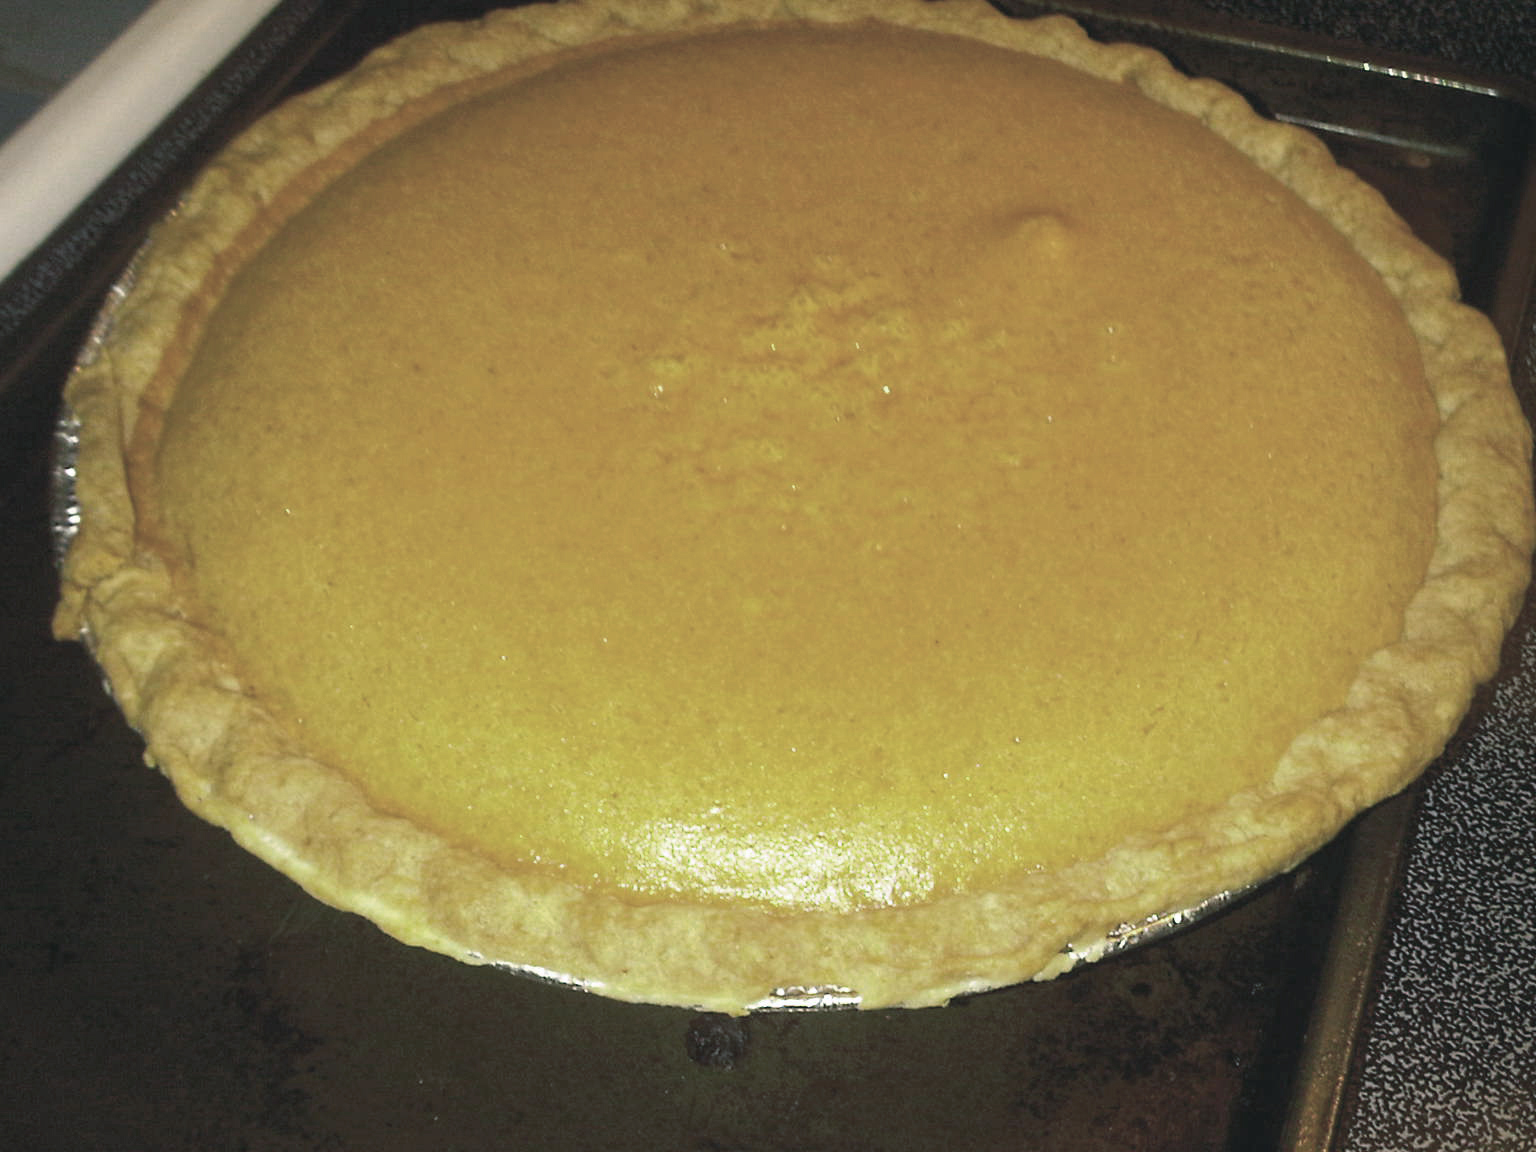 ... Saturdays: It's the Great Pumpkin Cheesecake Pie, Charlie Brown